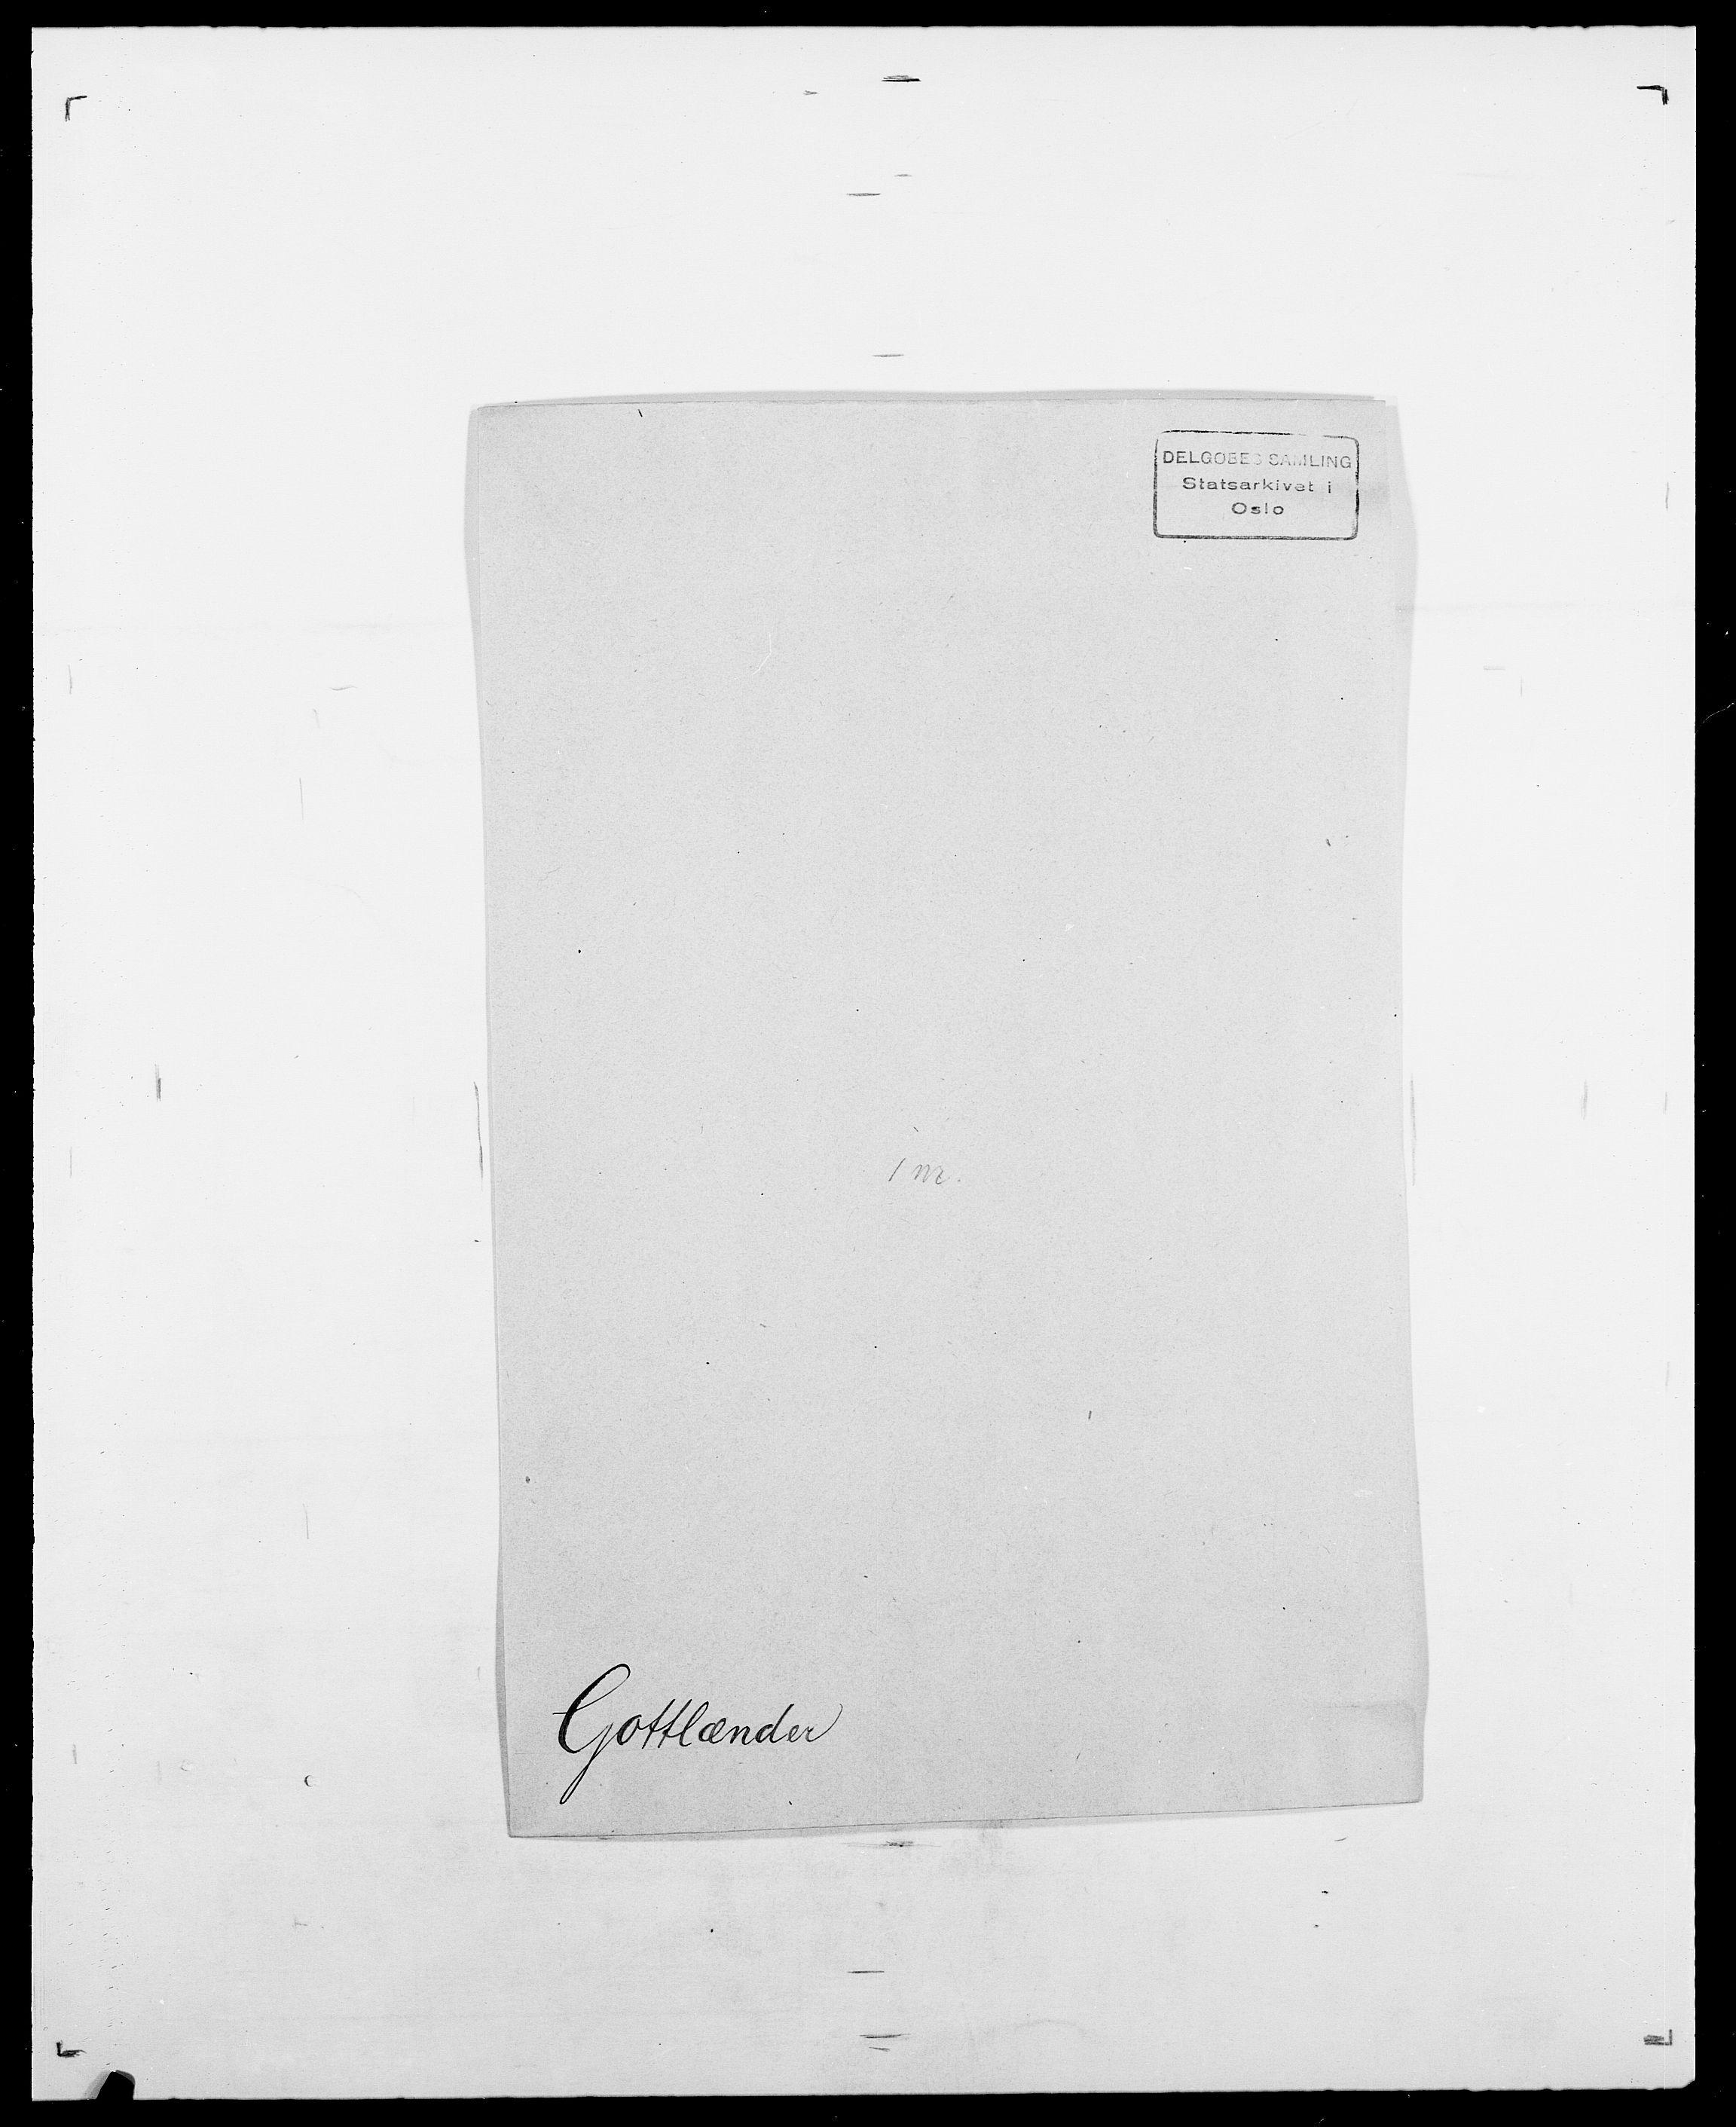 SAO, Delgobe, Charles Antoine - samling, D/Da/L0014: Giebdhausen - Grip, s. 401